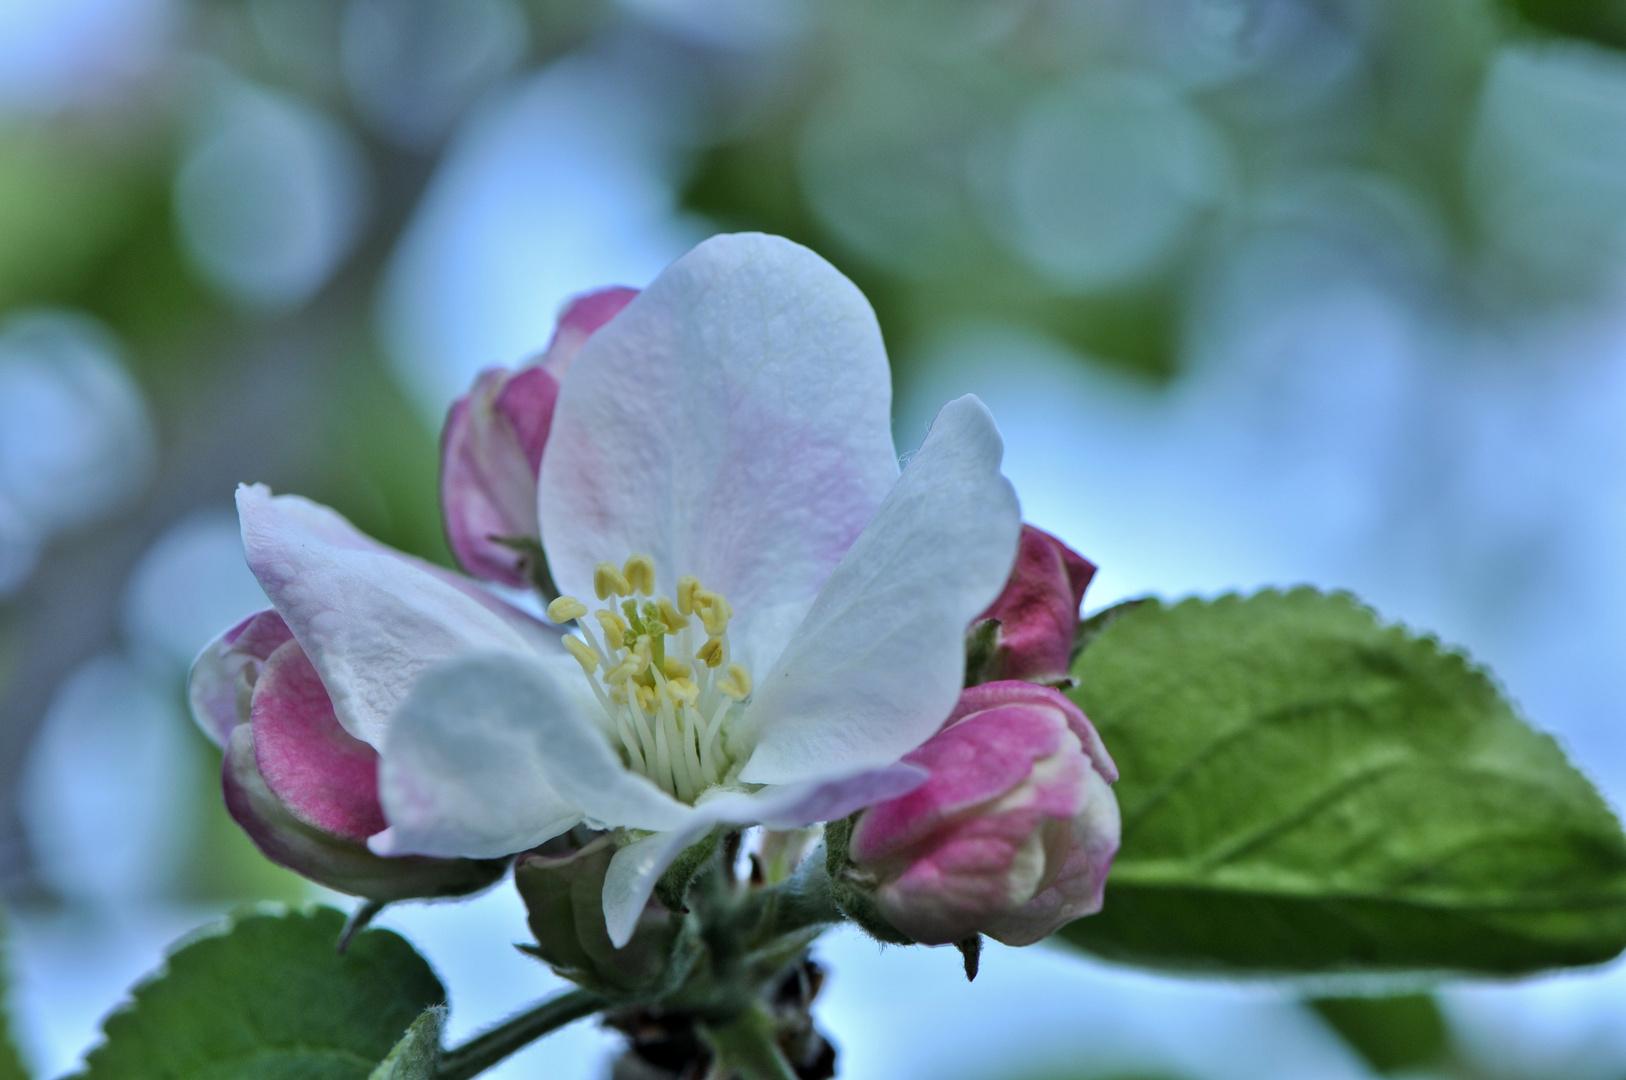 verspätete Apfelblüte